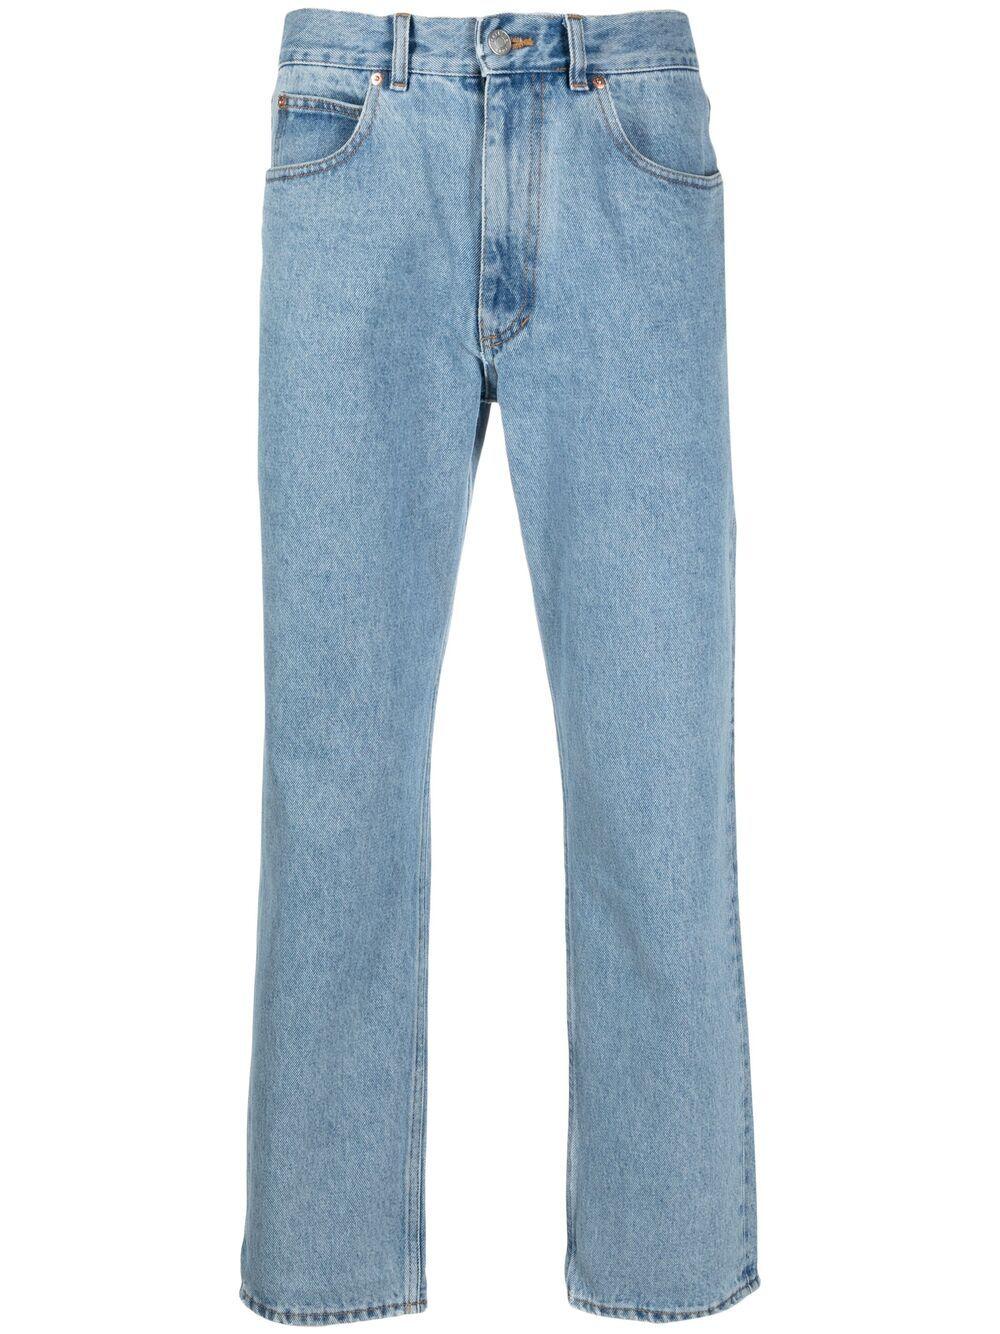 Martine Rose jeans con stampa logo uomo denim MARTINE ROSE   Jeans   MR223DMR063